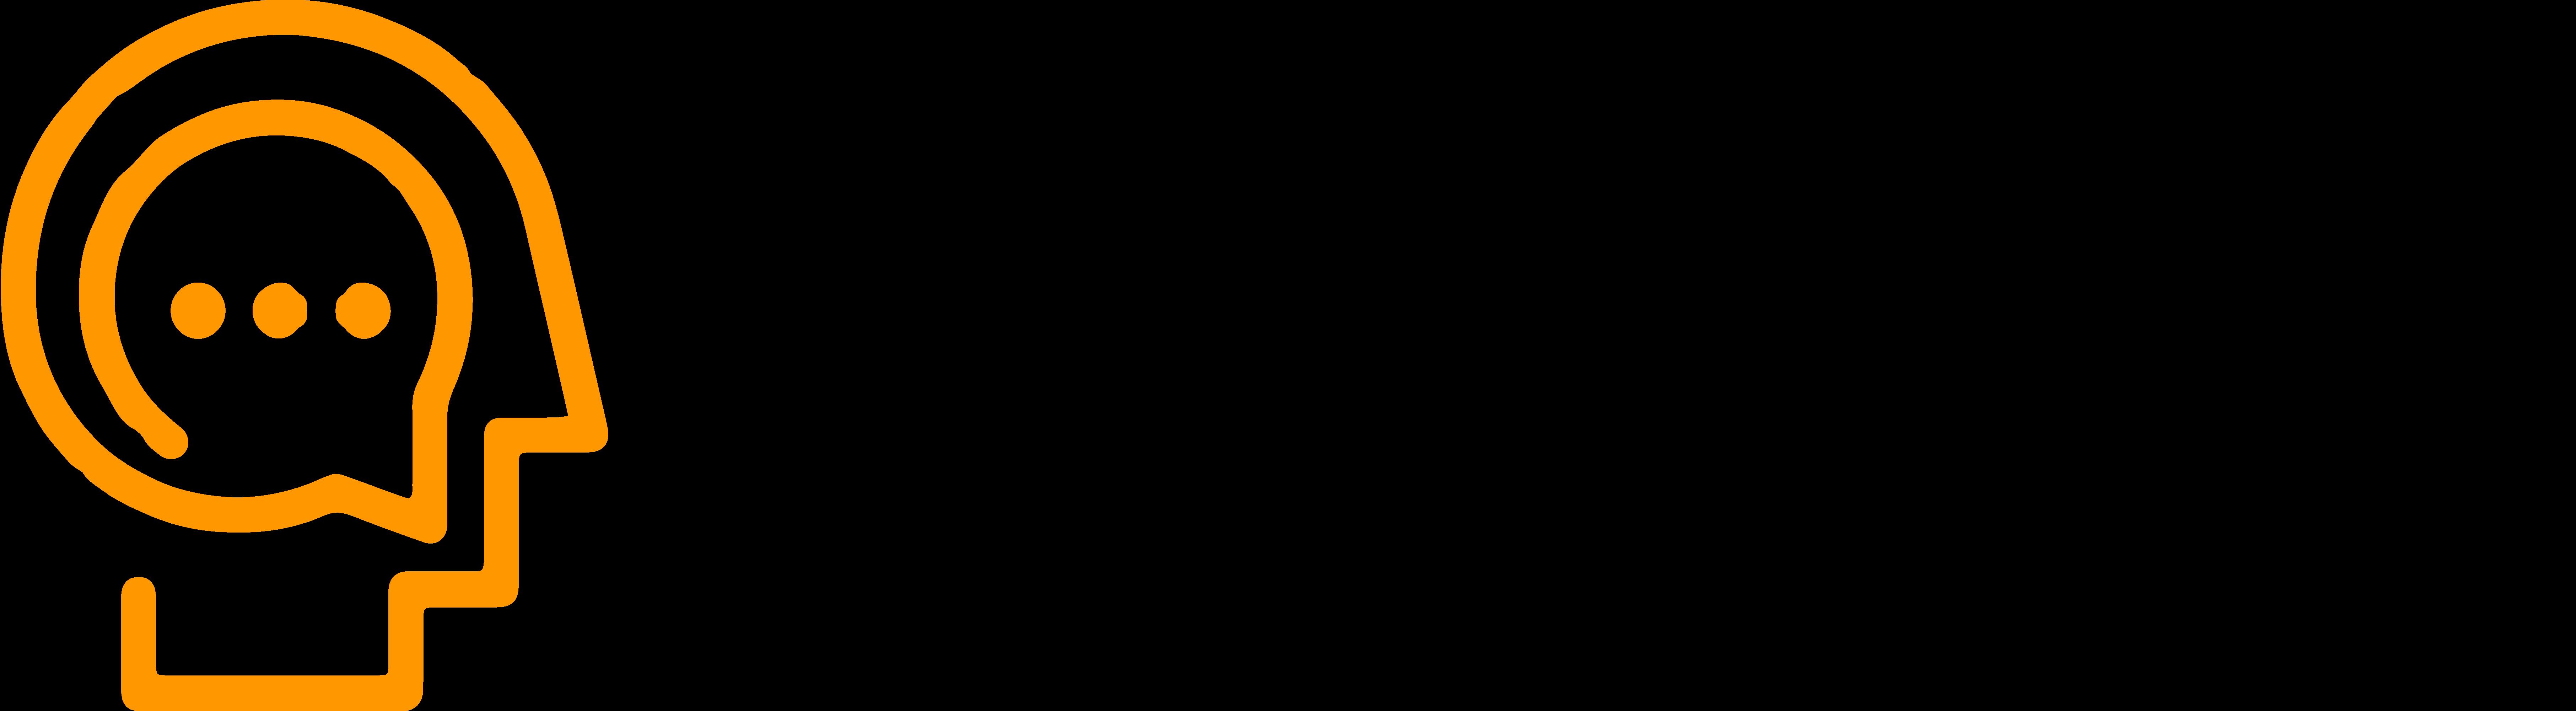 ForoTOC